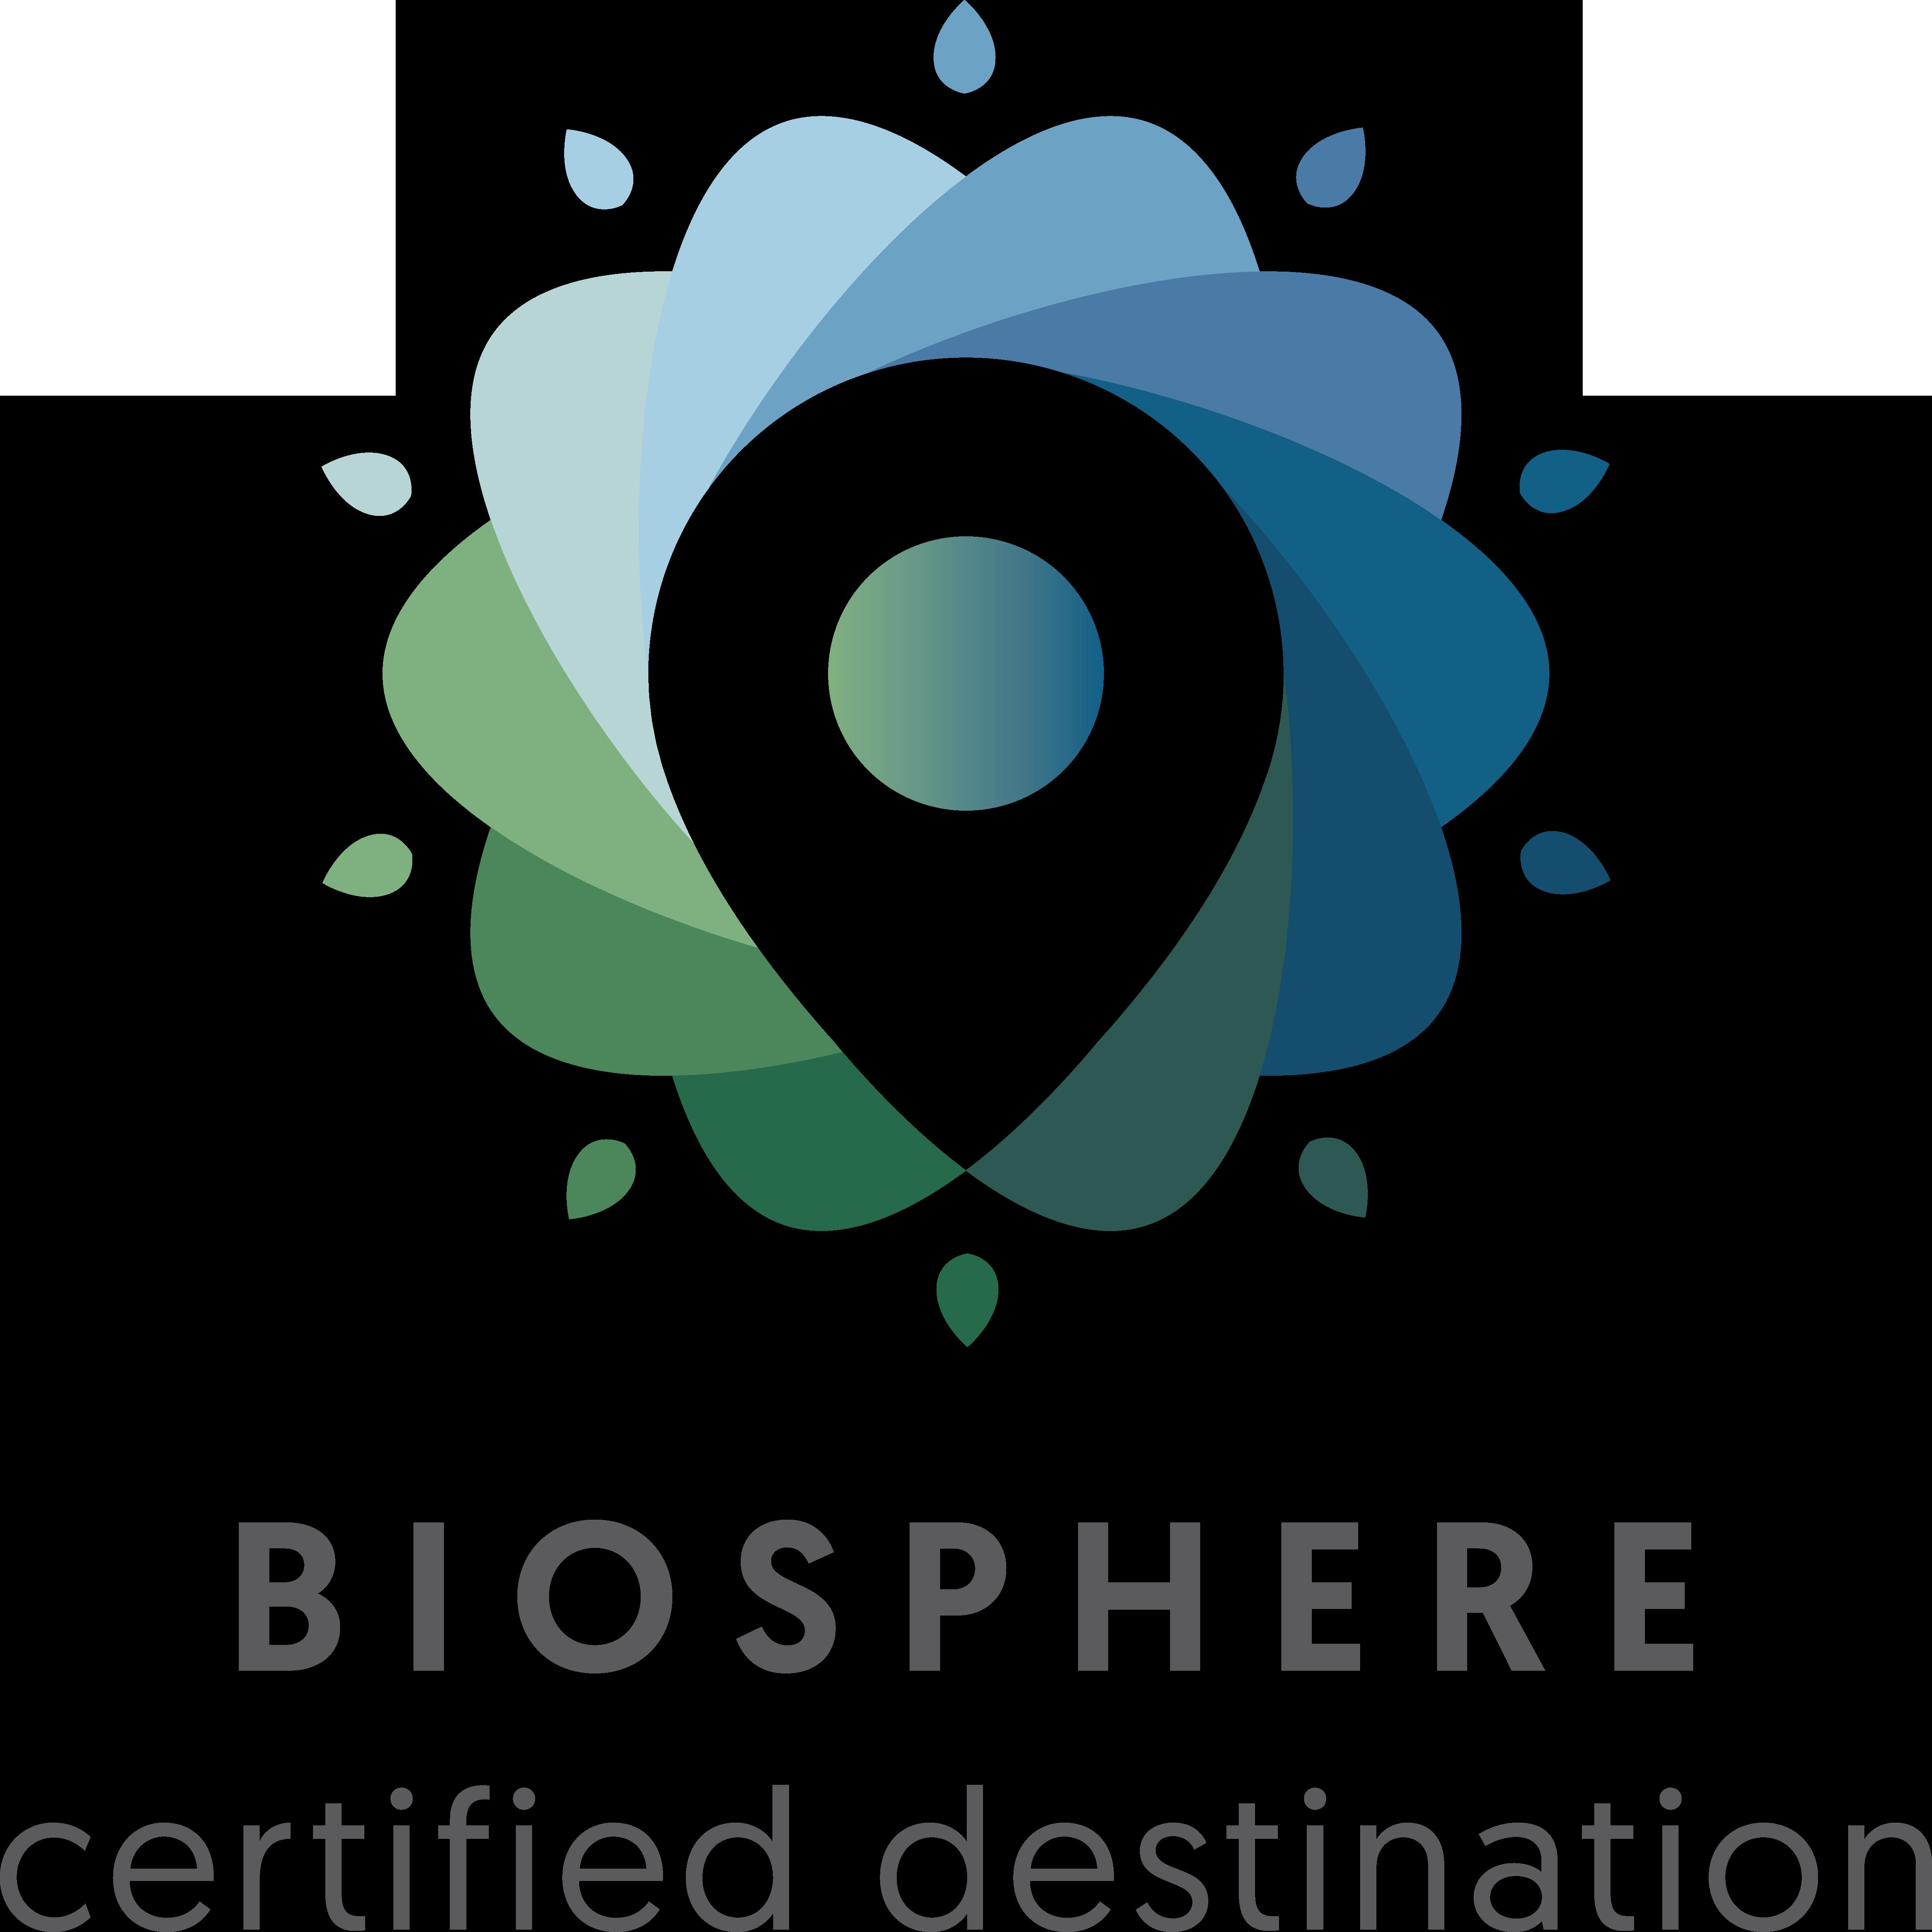 sello_biosphere_certified_destination_5000x5000